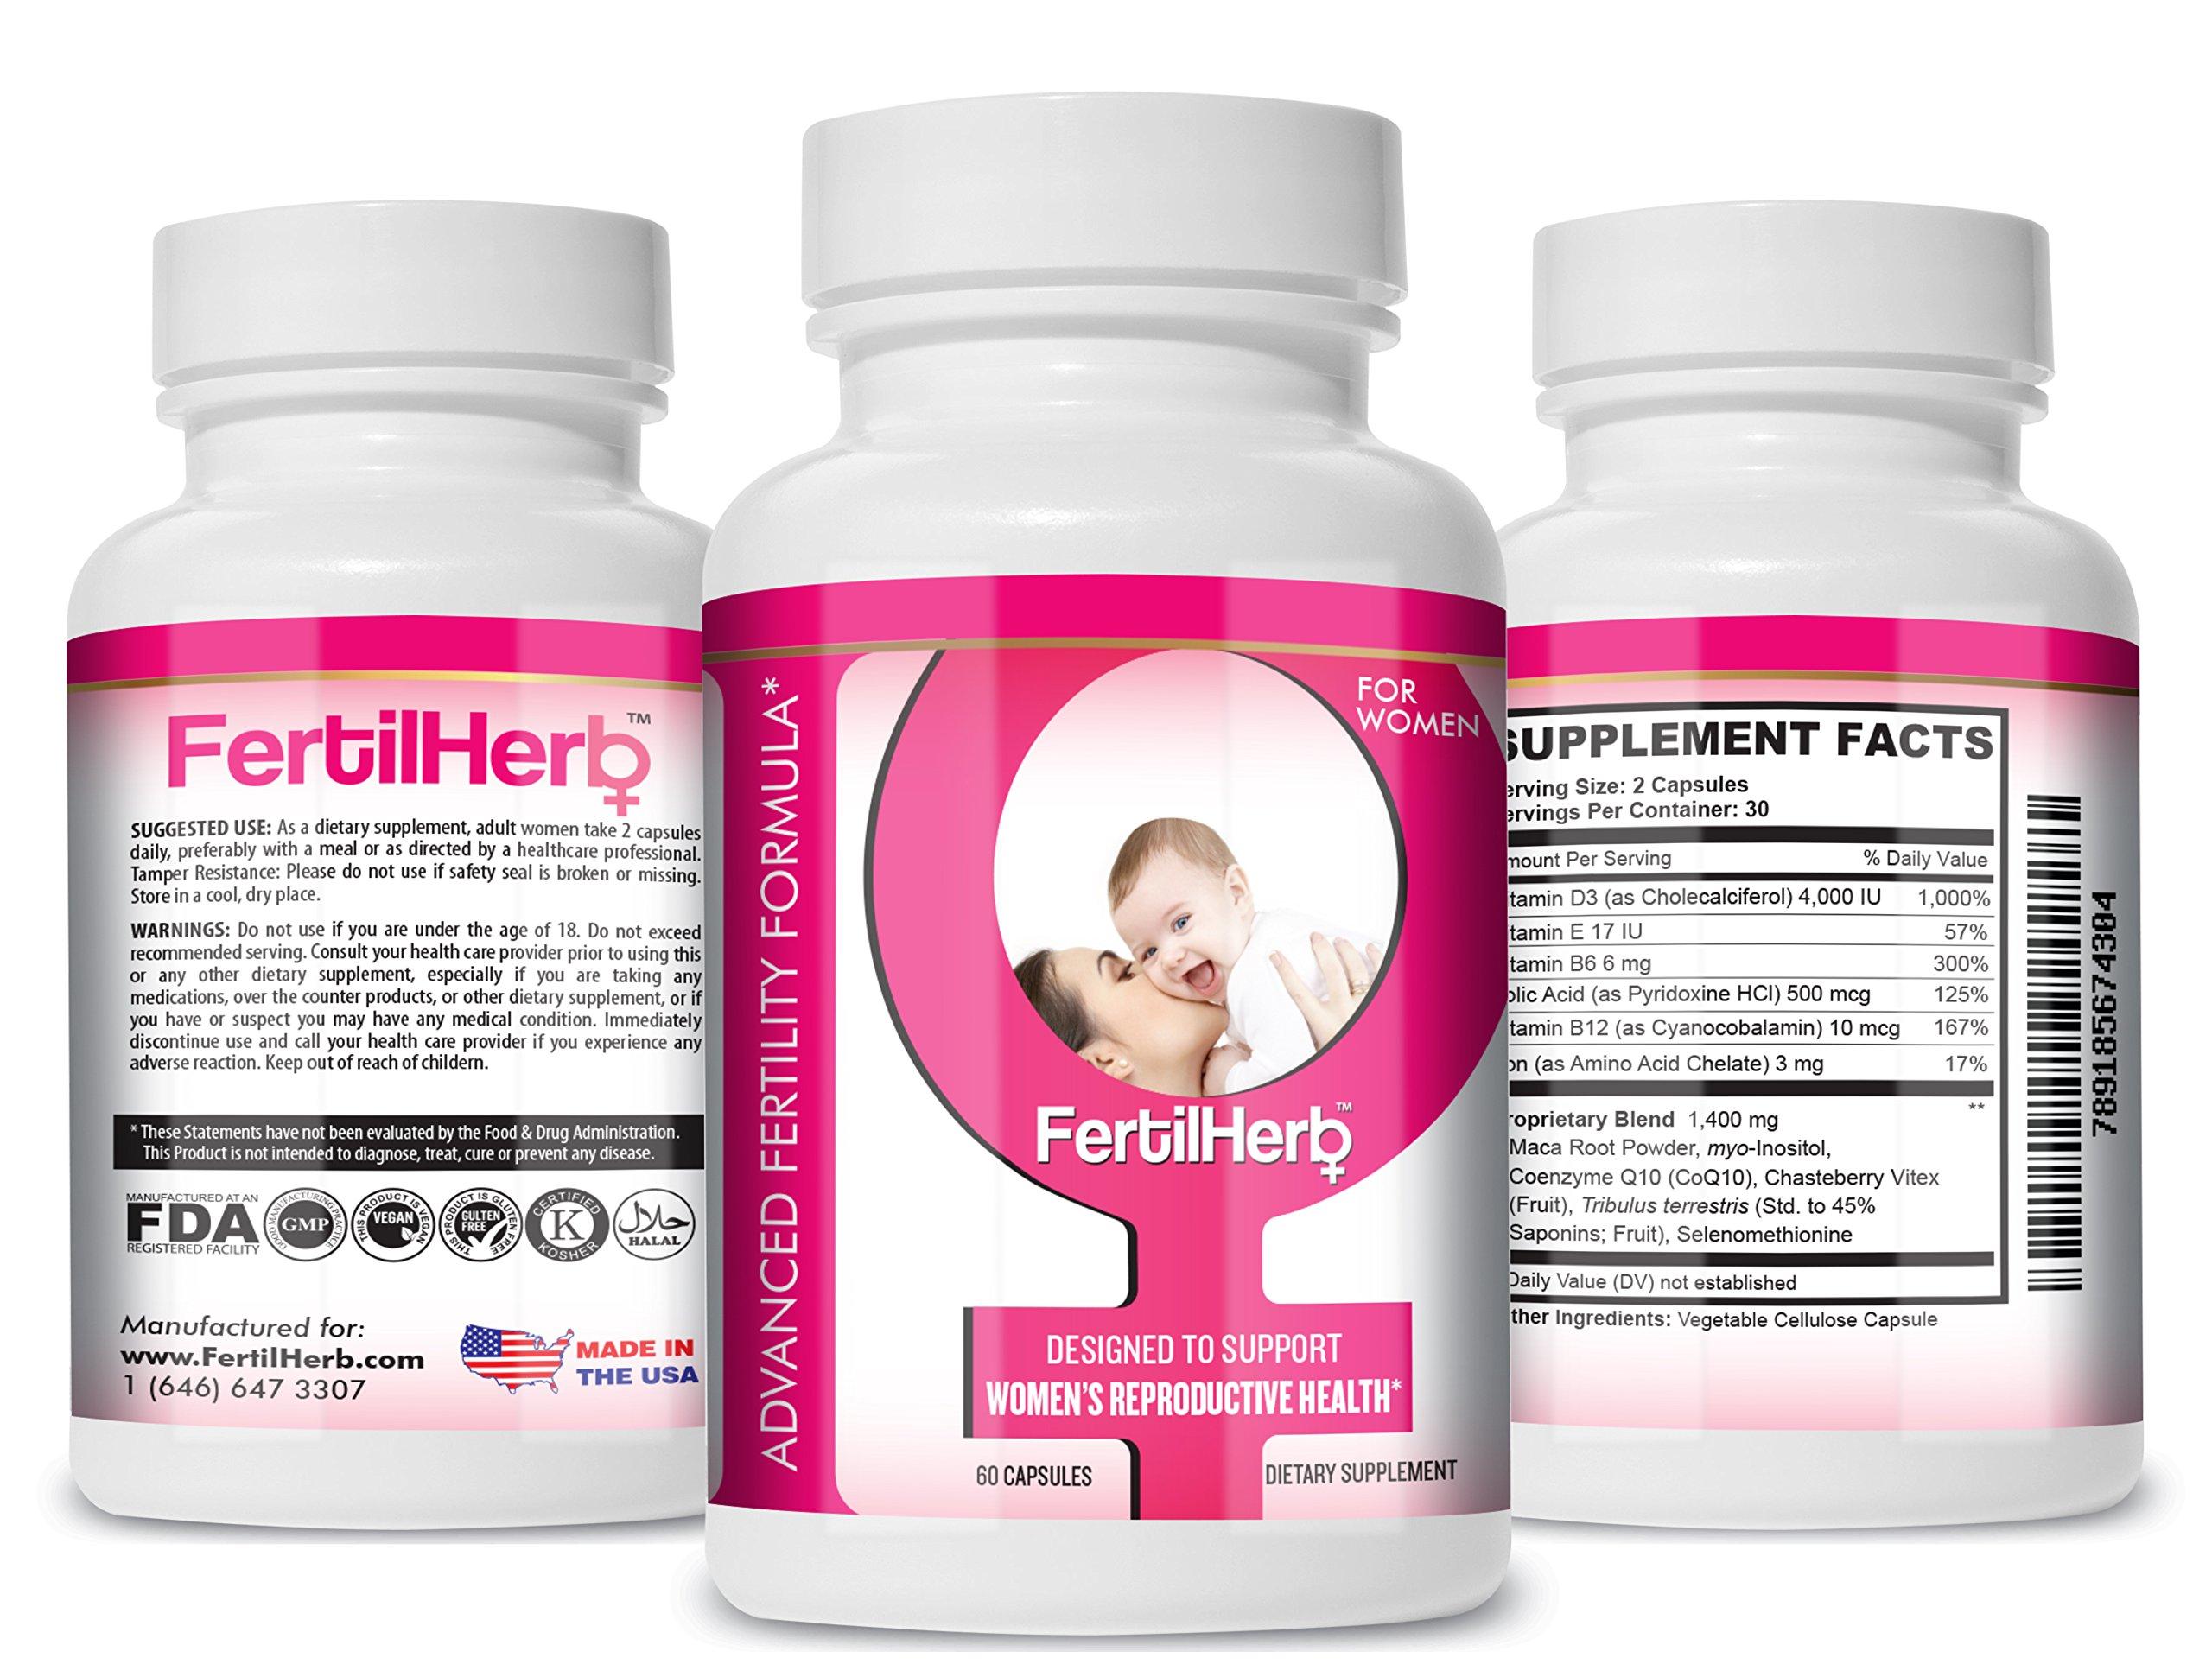 FertilHerb® for Women Fertility Supplement (3-Pack, 3-Month Supply) | Doctor Recommended, All Natural, Antioxidants, Herbal Fertility Formula & Multivitamin for Women, 30 Servings Per Bottle